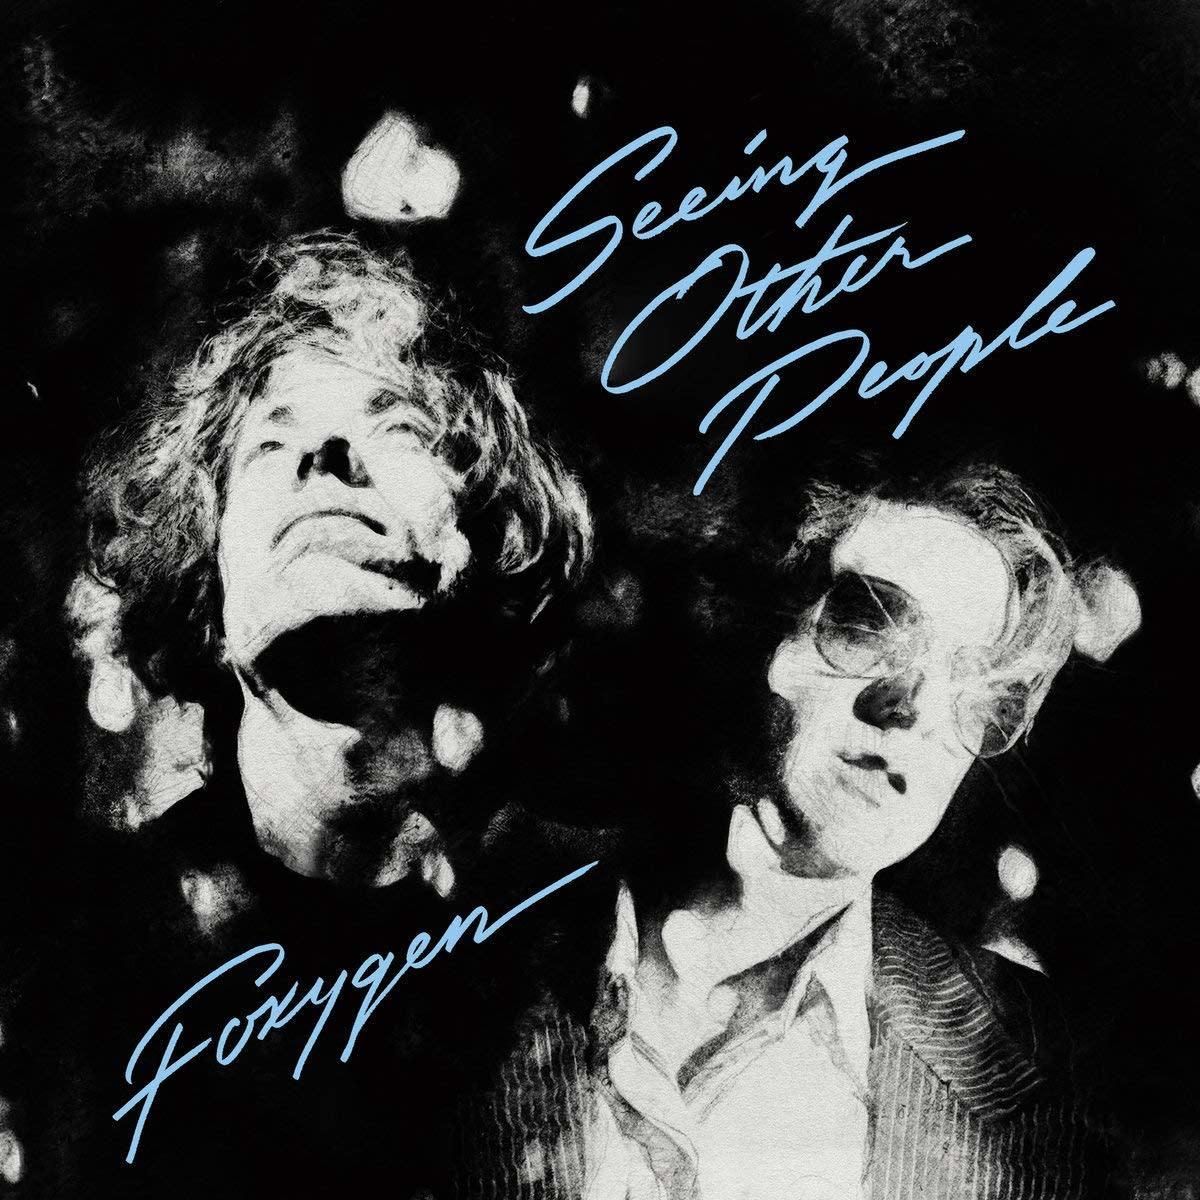 Foxygen - Seeing Other People (Deluxe 2LP)